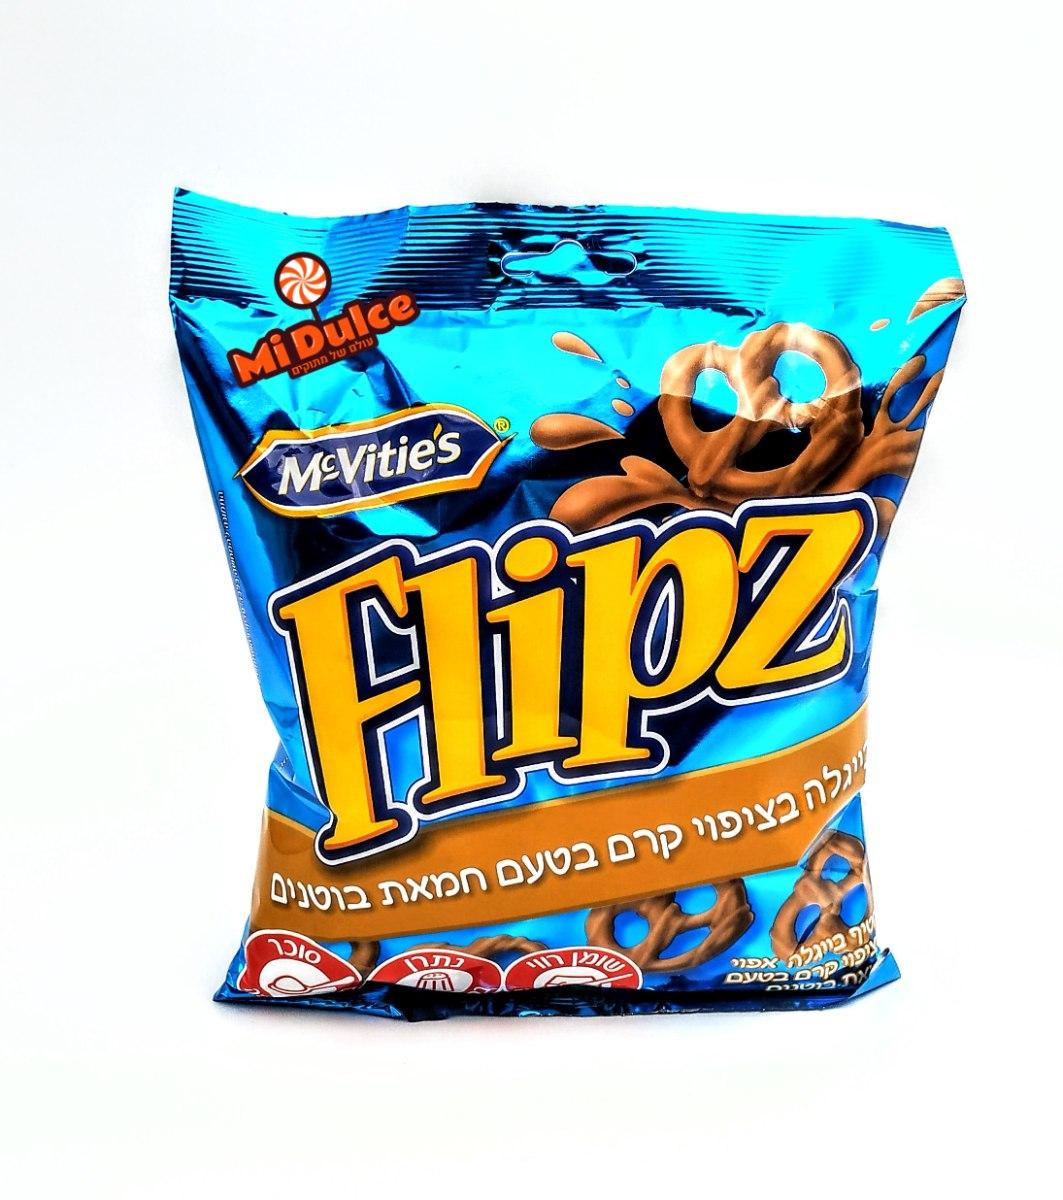 Flipz peanut butter cream